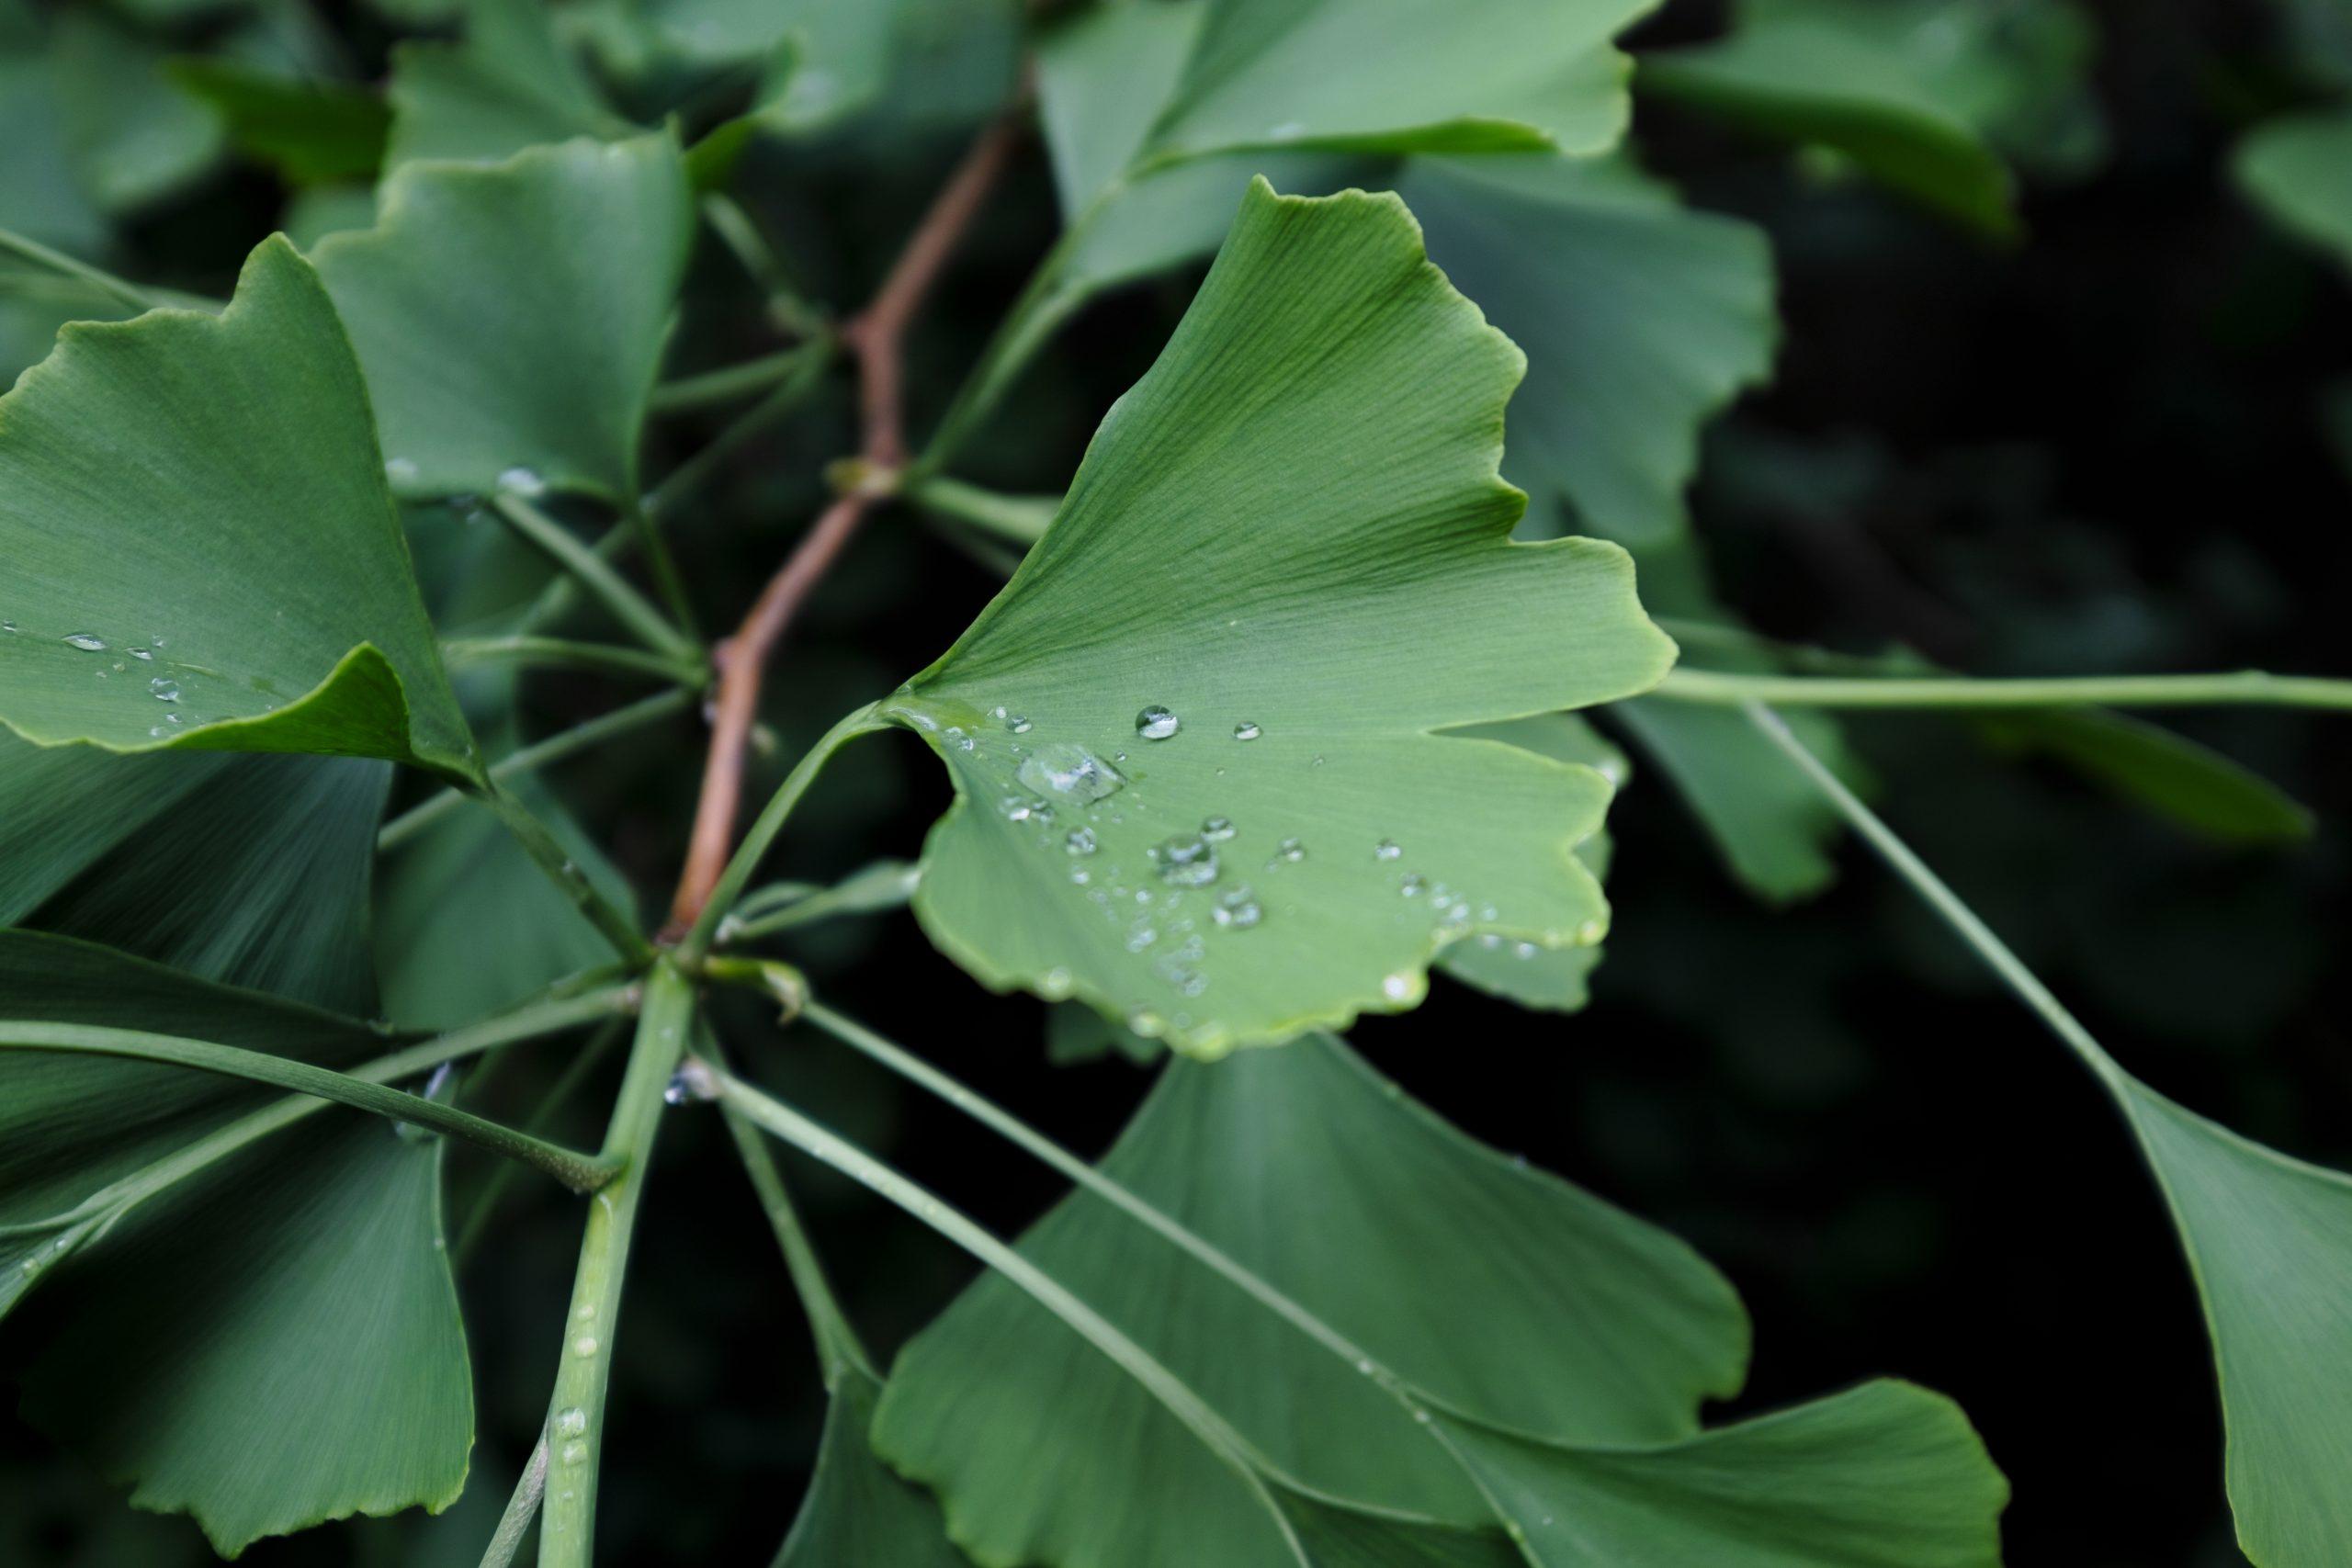 Ginkgo Leaves with Raindrops Oregon 25 May 2021 Copyright Steve J Davis